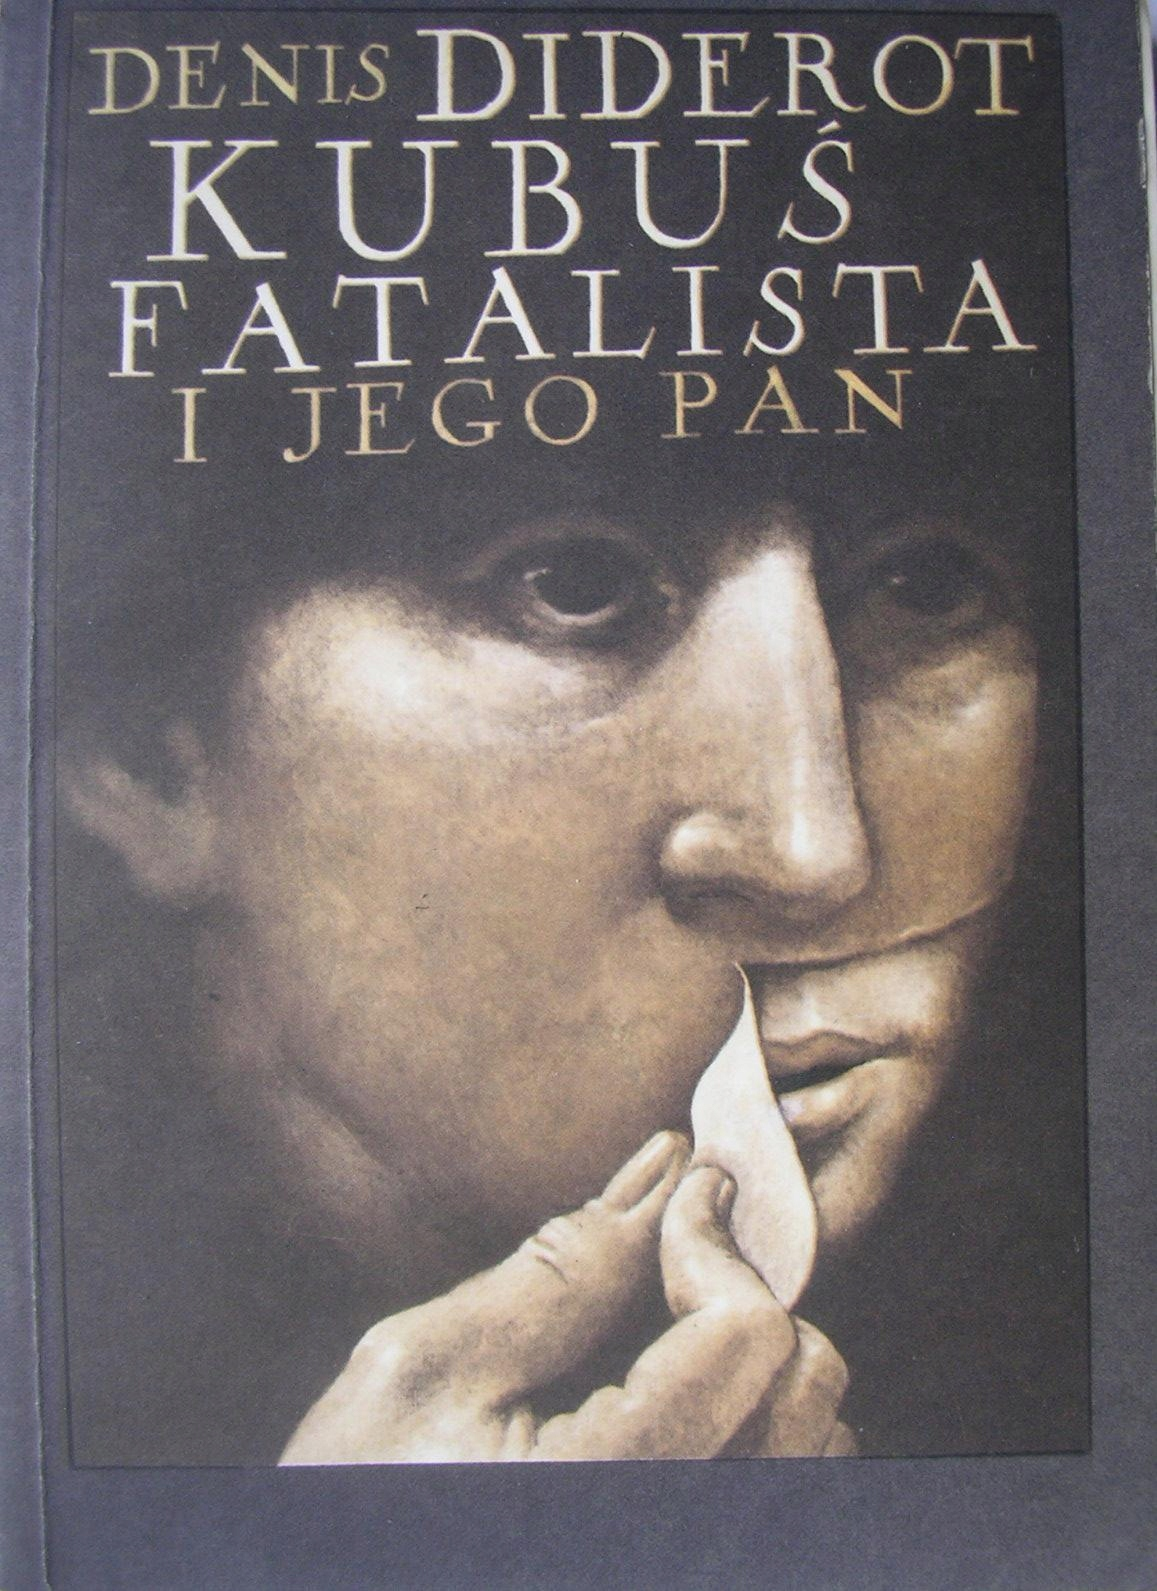 Kubuś fatalista i jego pan - Denis Diderot DB